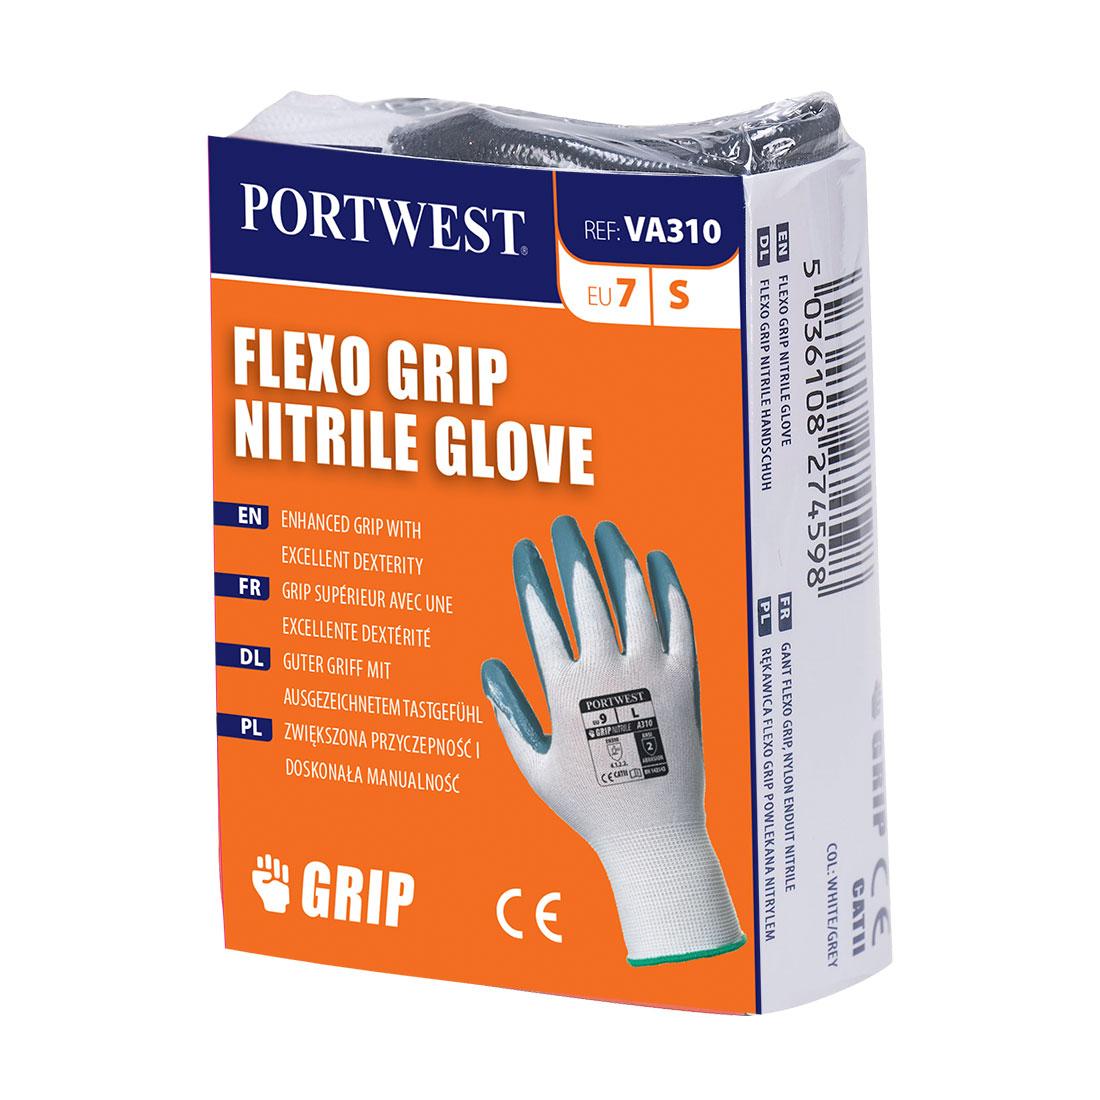 Portwest Flexo Grip Nitrile Glove (Vending) - VA310